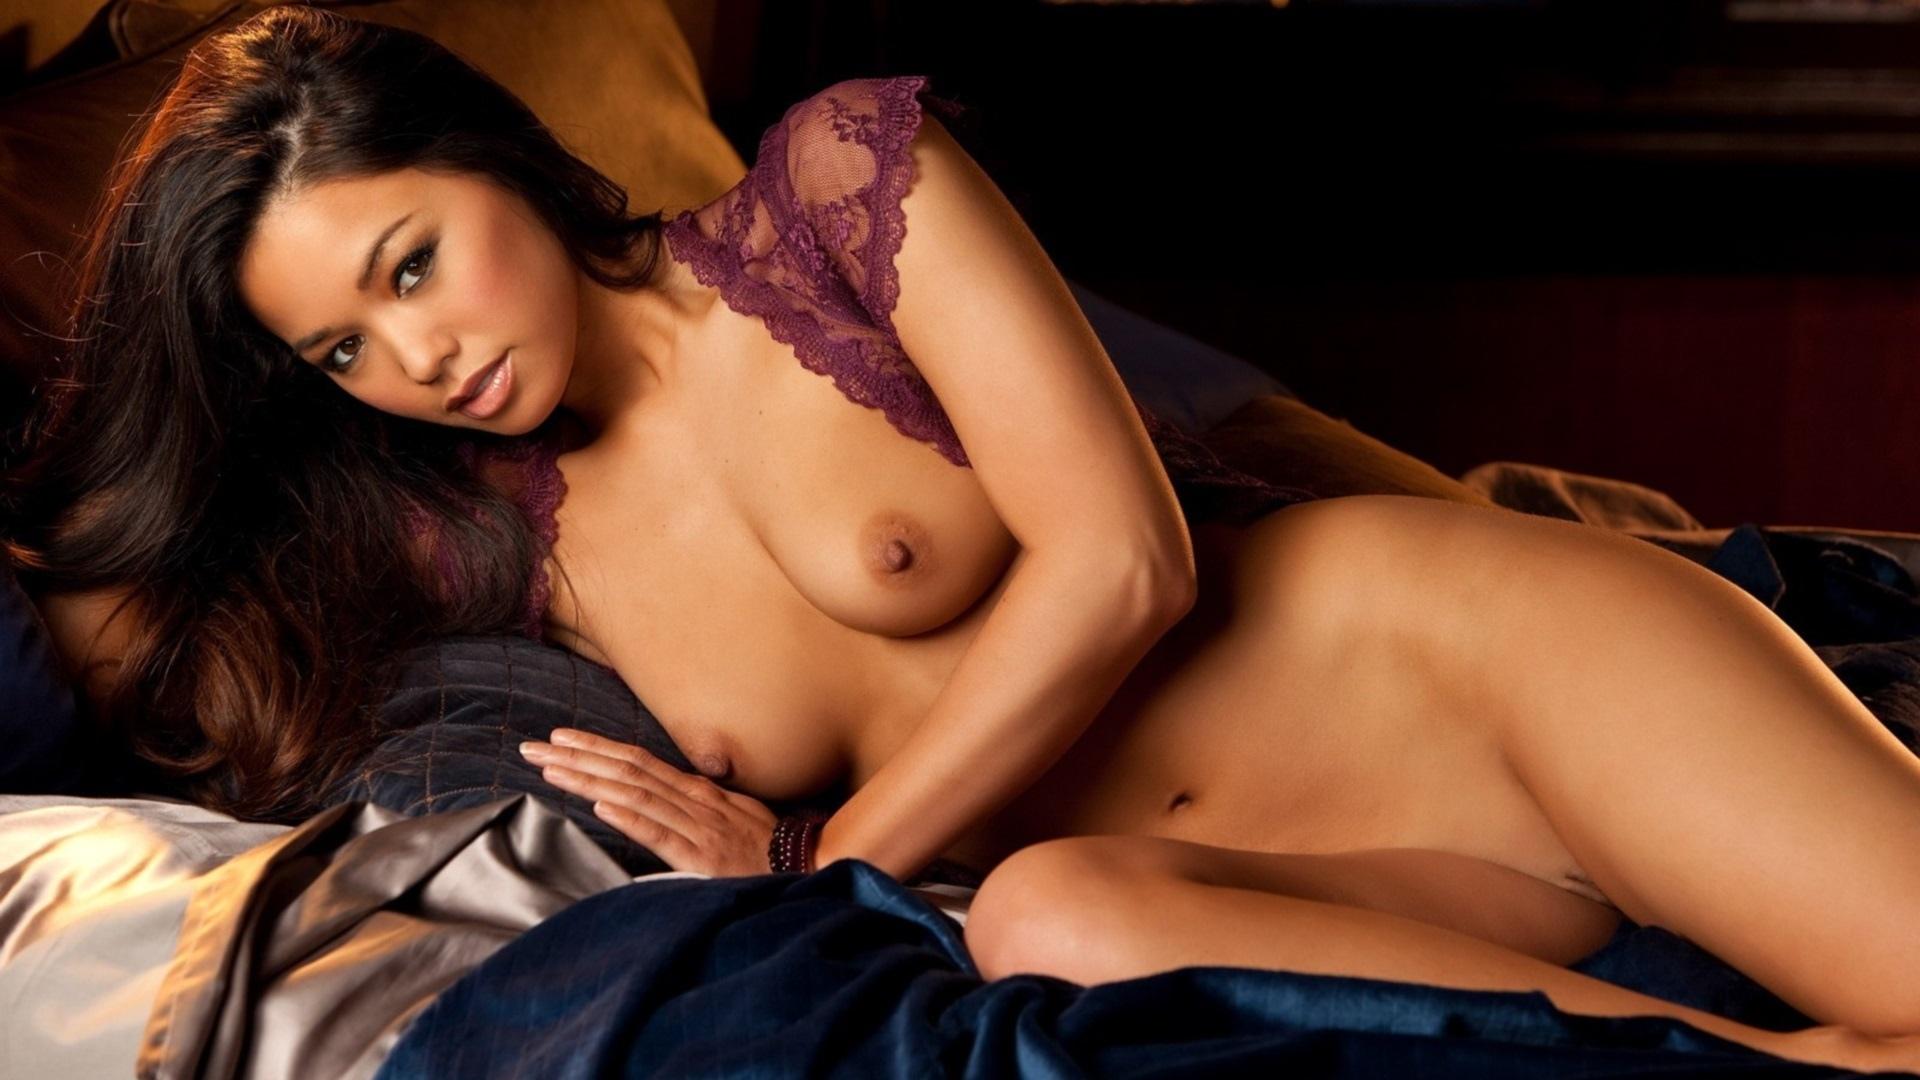 Asian playmates naked 4